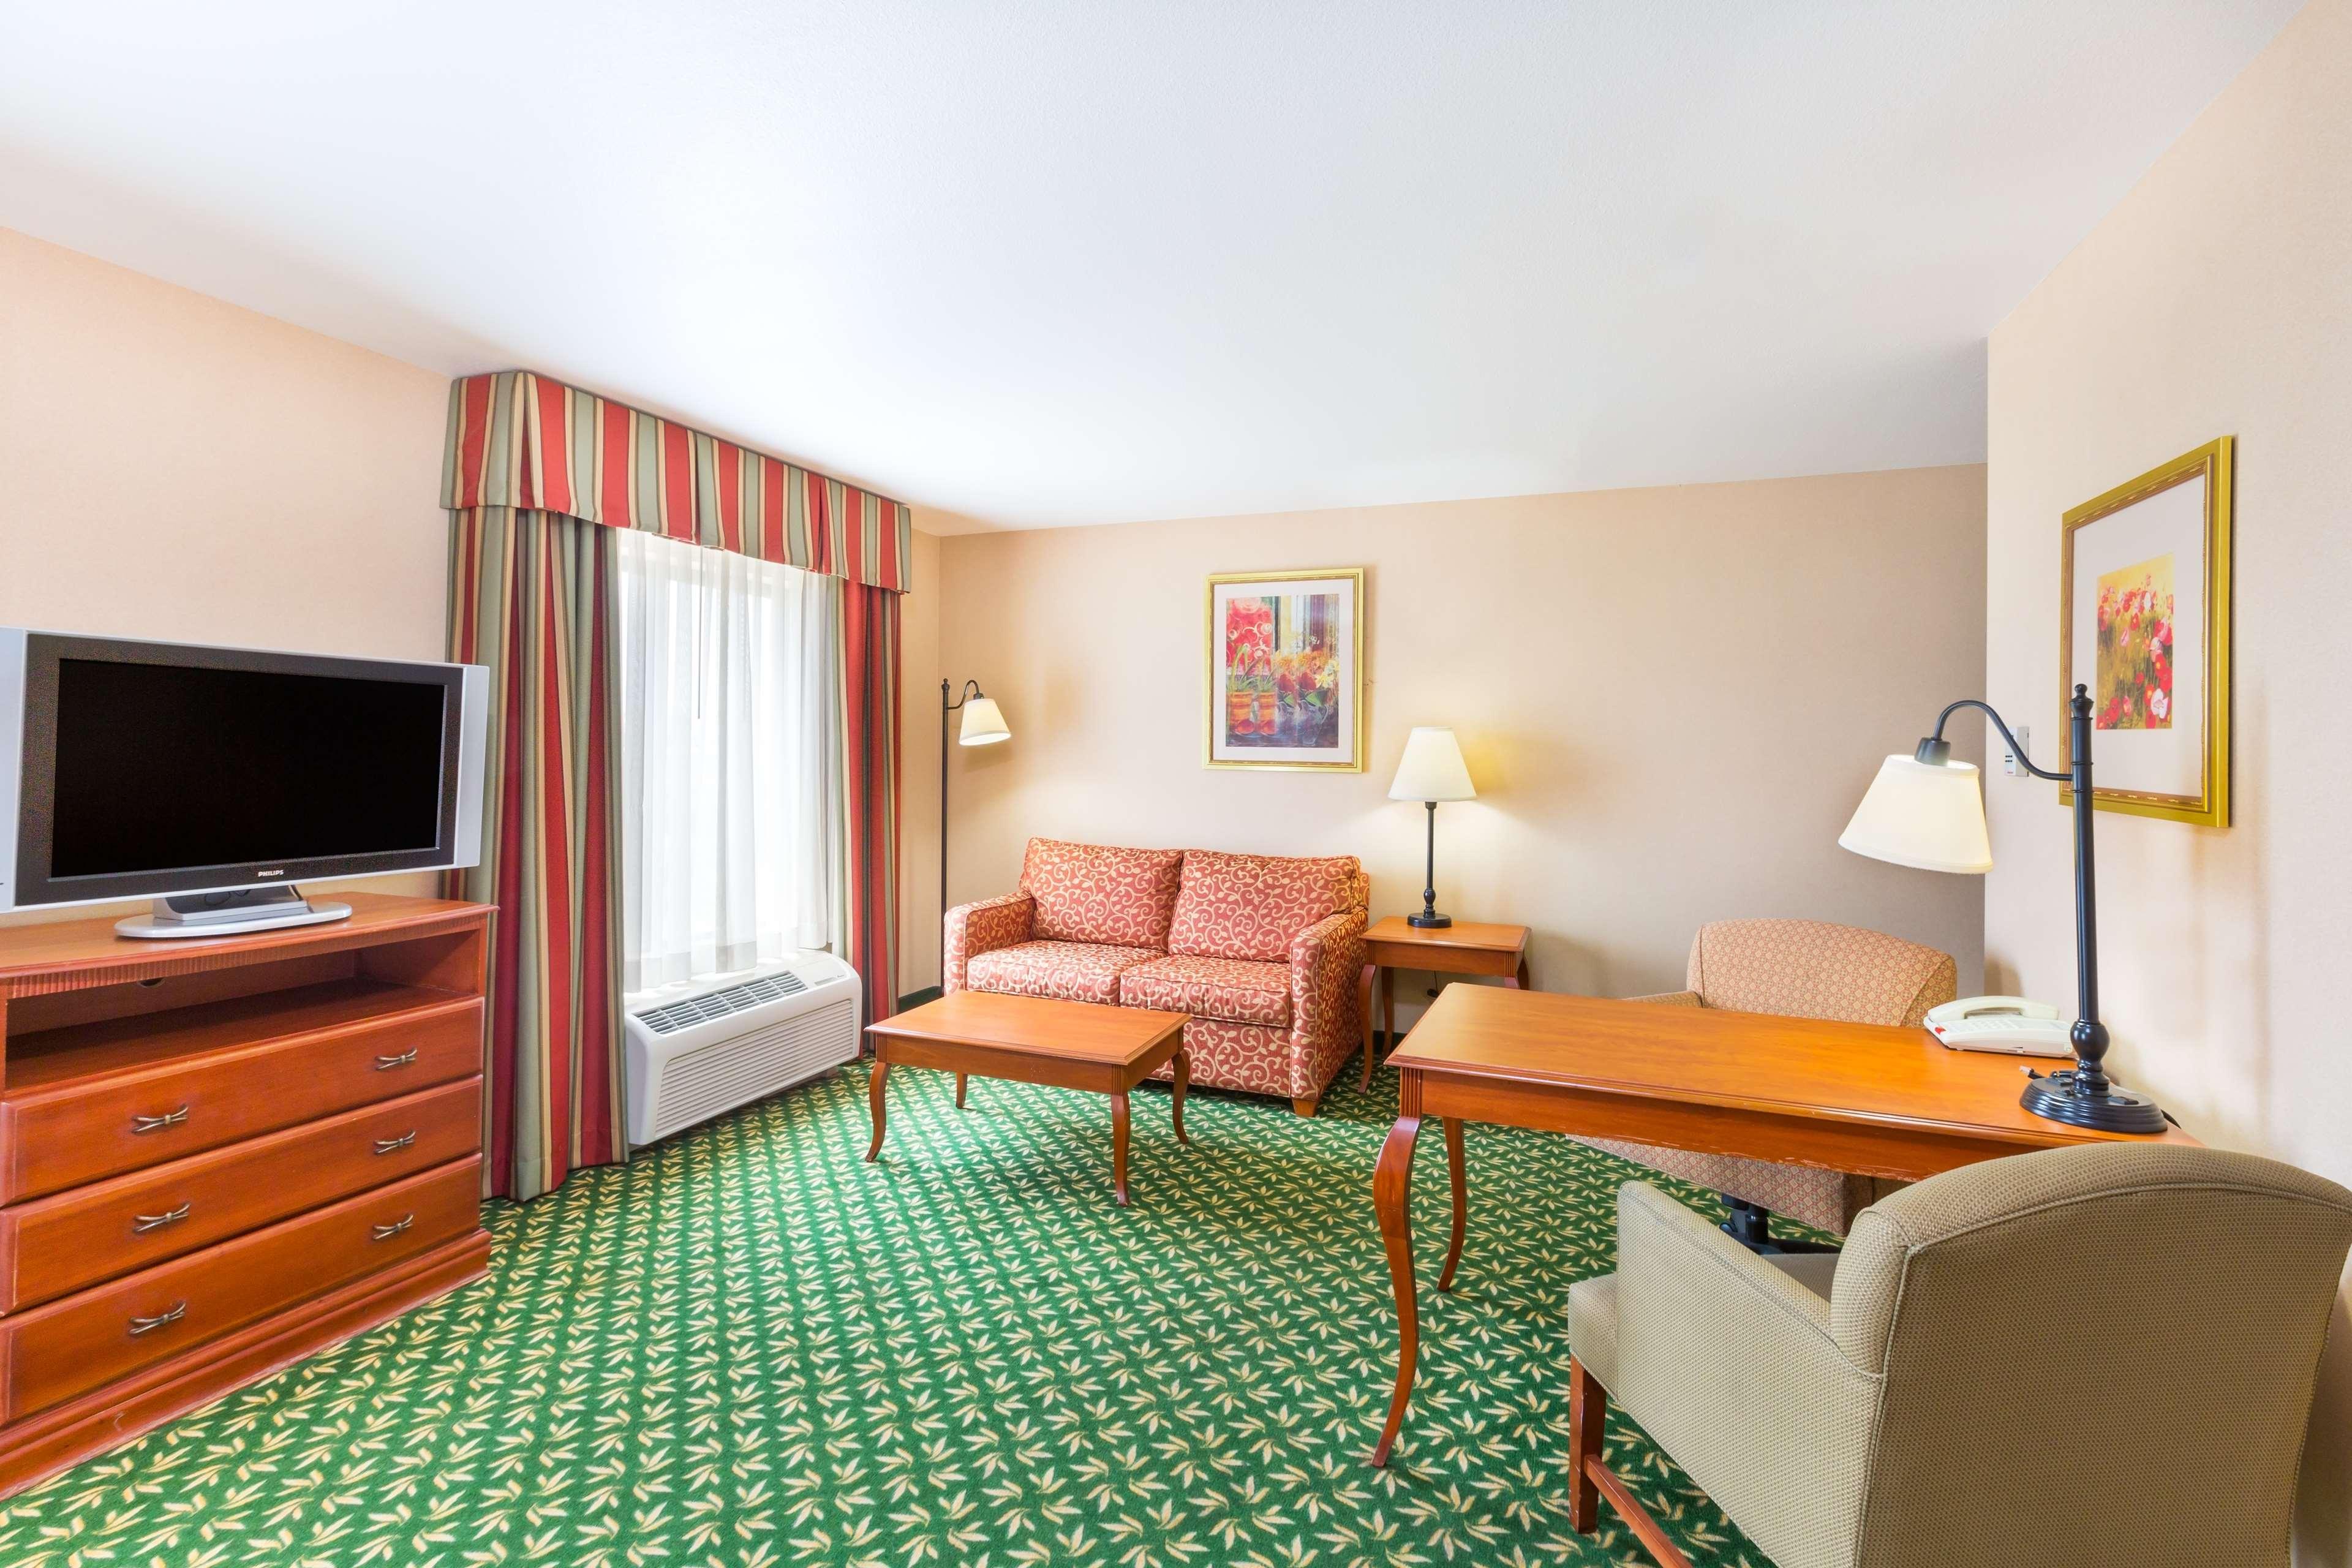 Hampton Inn & Suites Rohnert Park - Sonoma County image 13